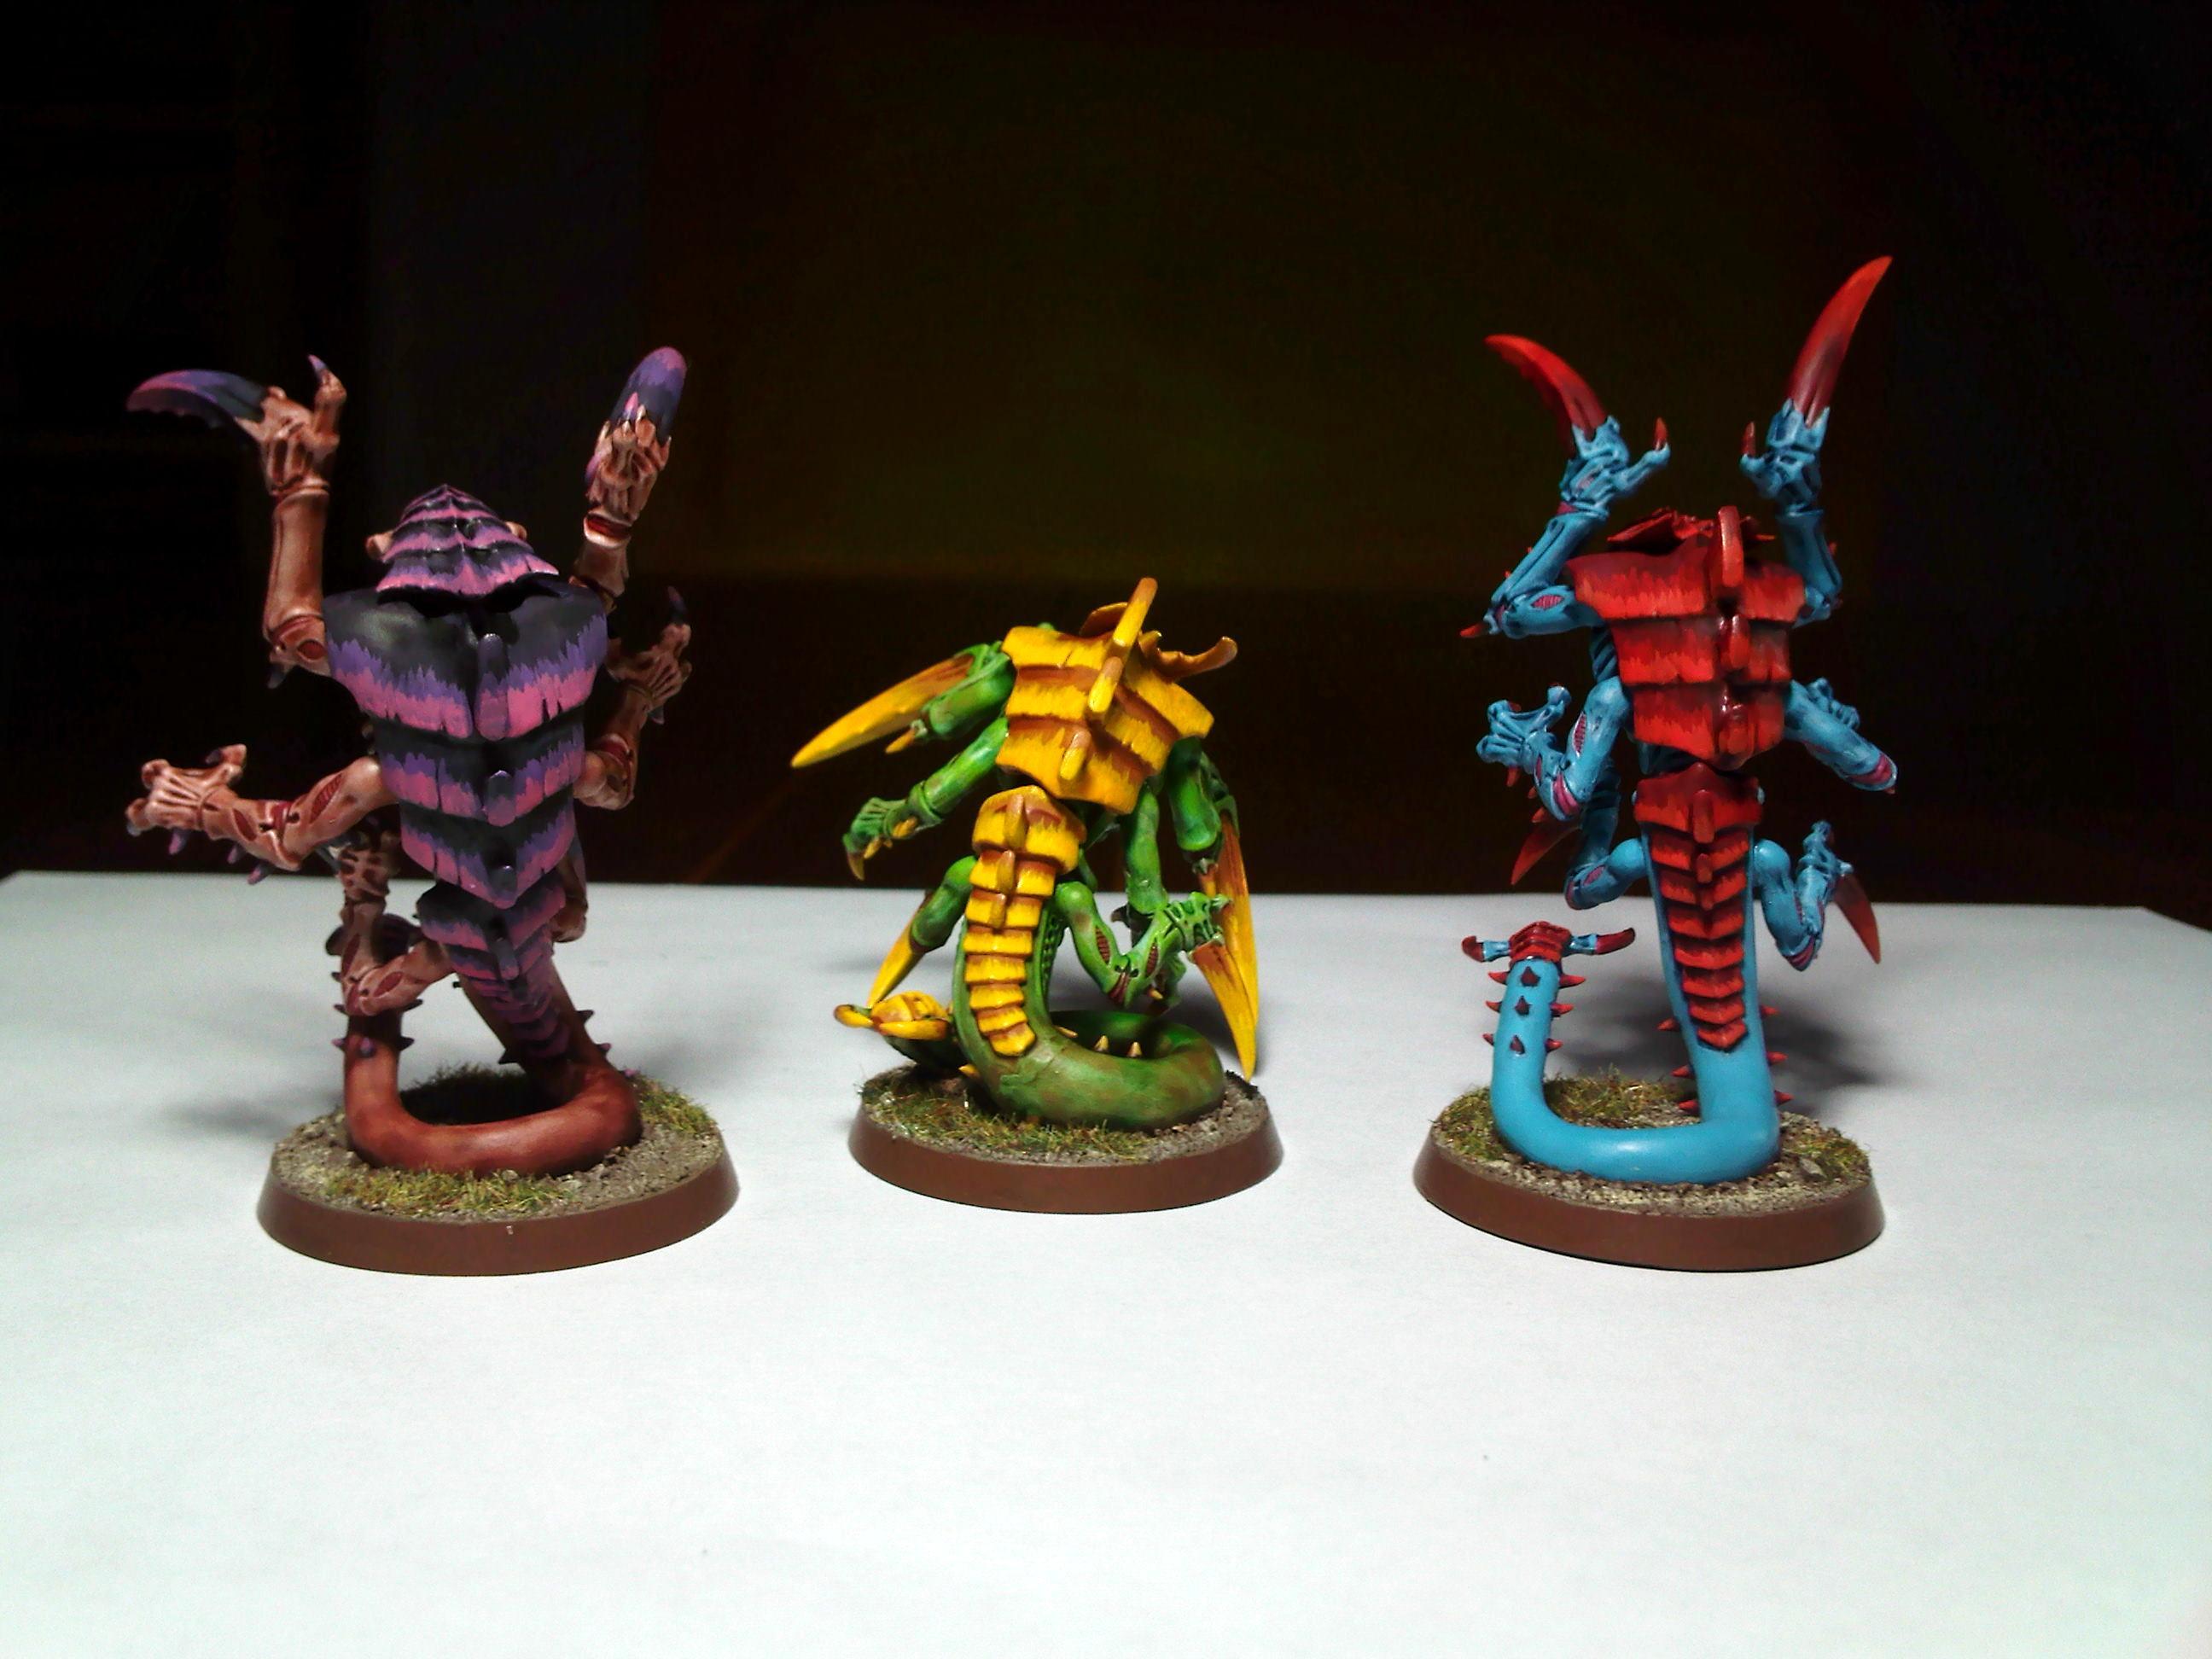 Ravener, Tyranid Ravener, Tyranids, Warhammer 40,000